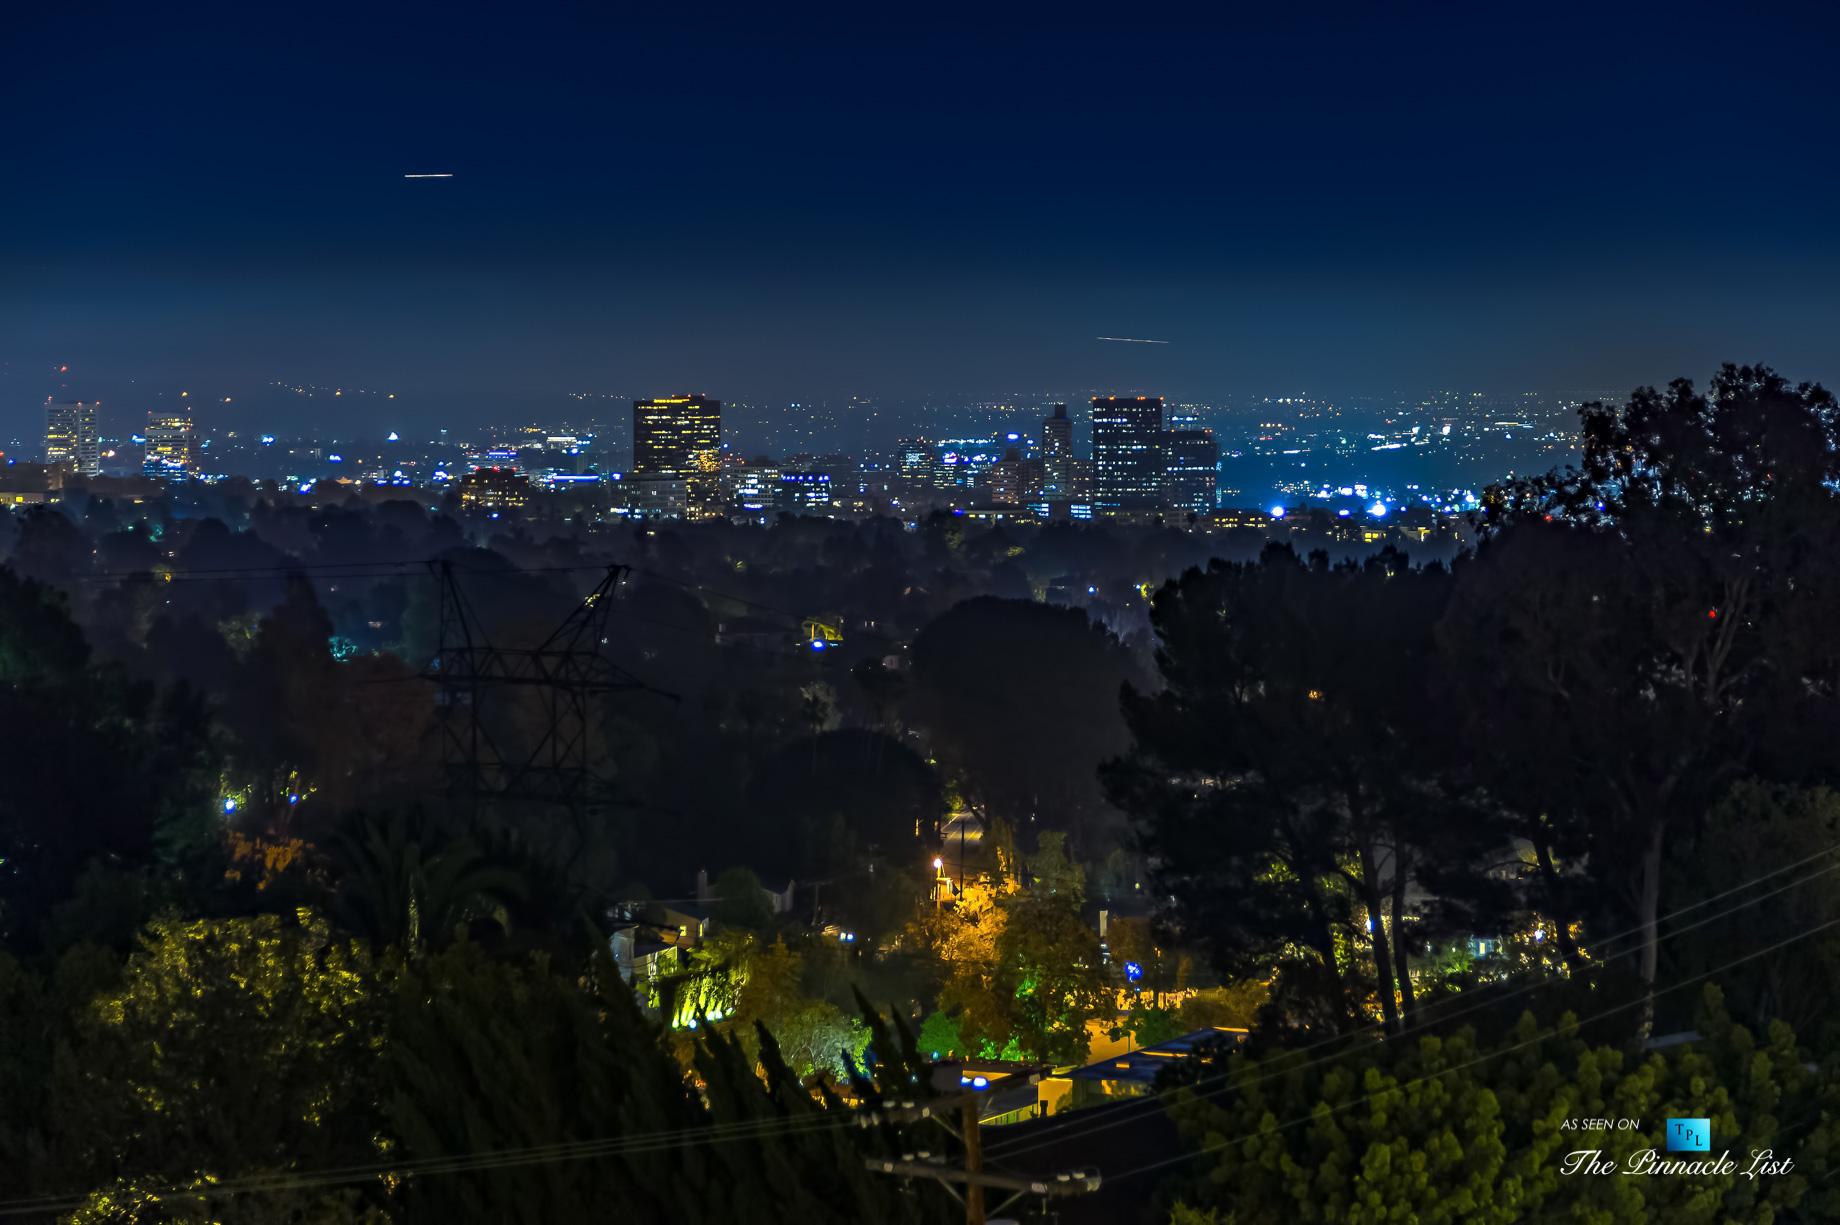 816 Glenmere Way, Los Angeles, CA, USA